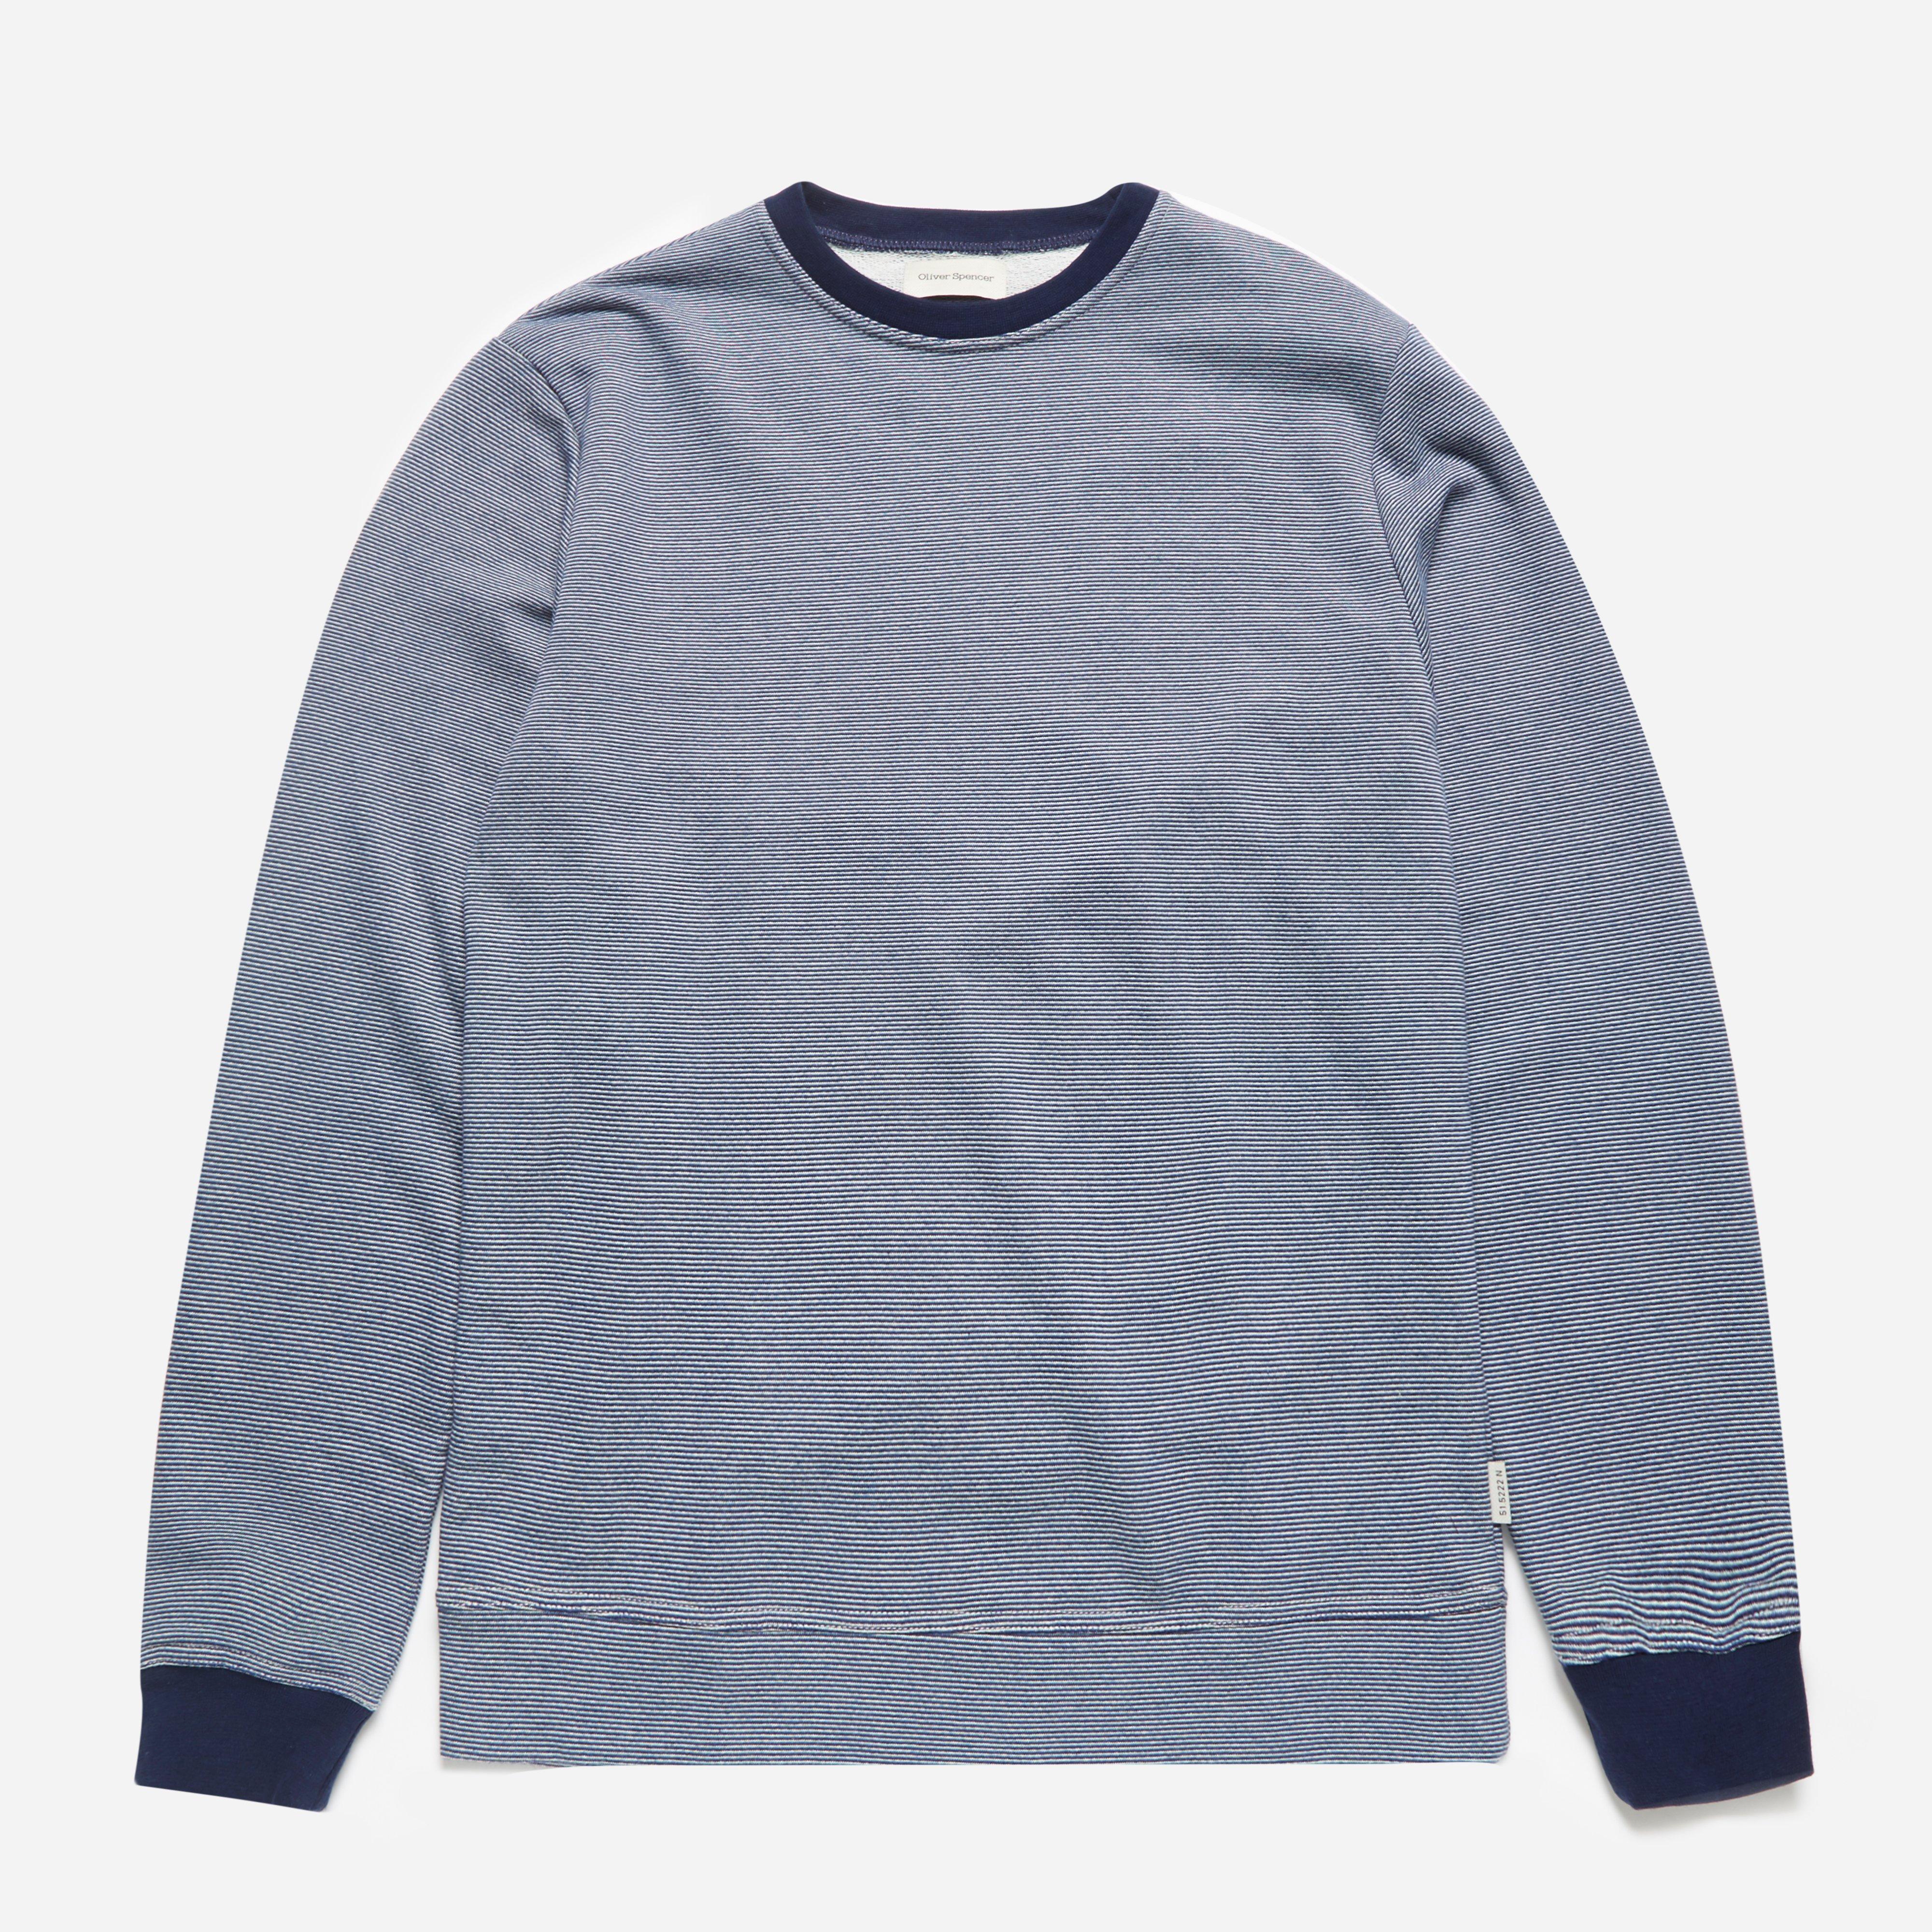 Oliver Spencer Mali Sweatshirt Navy Multi